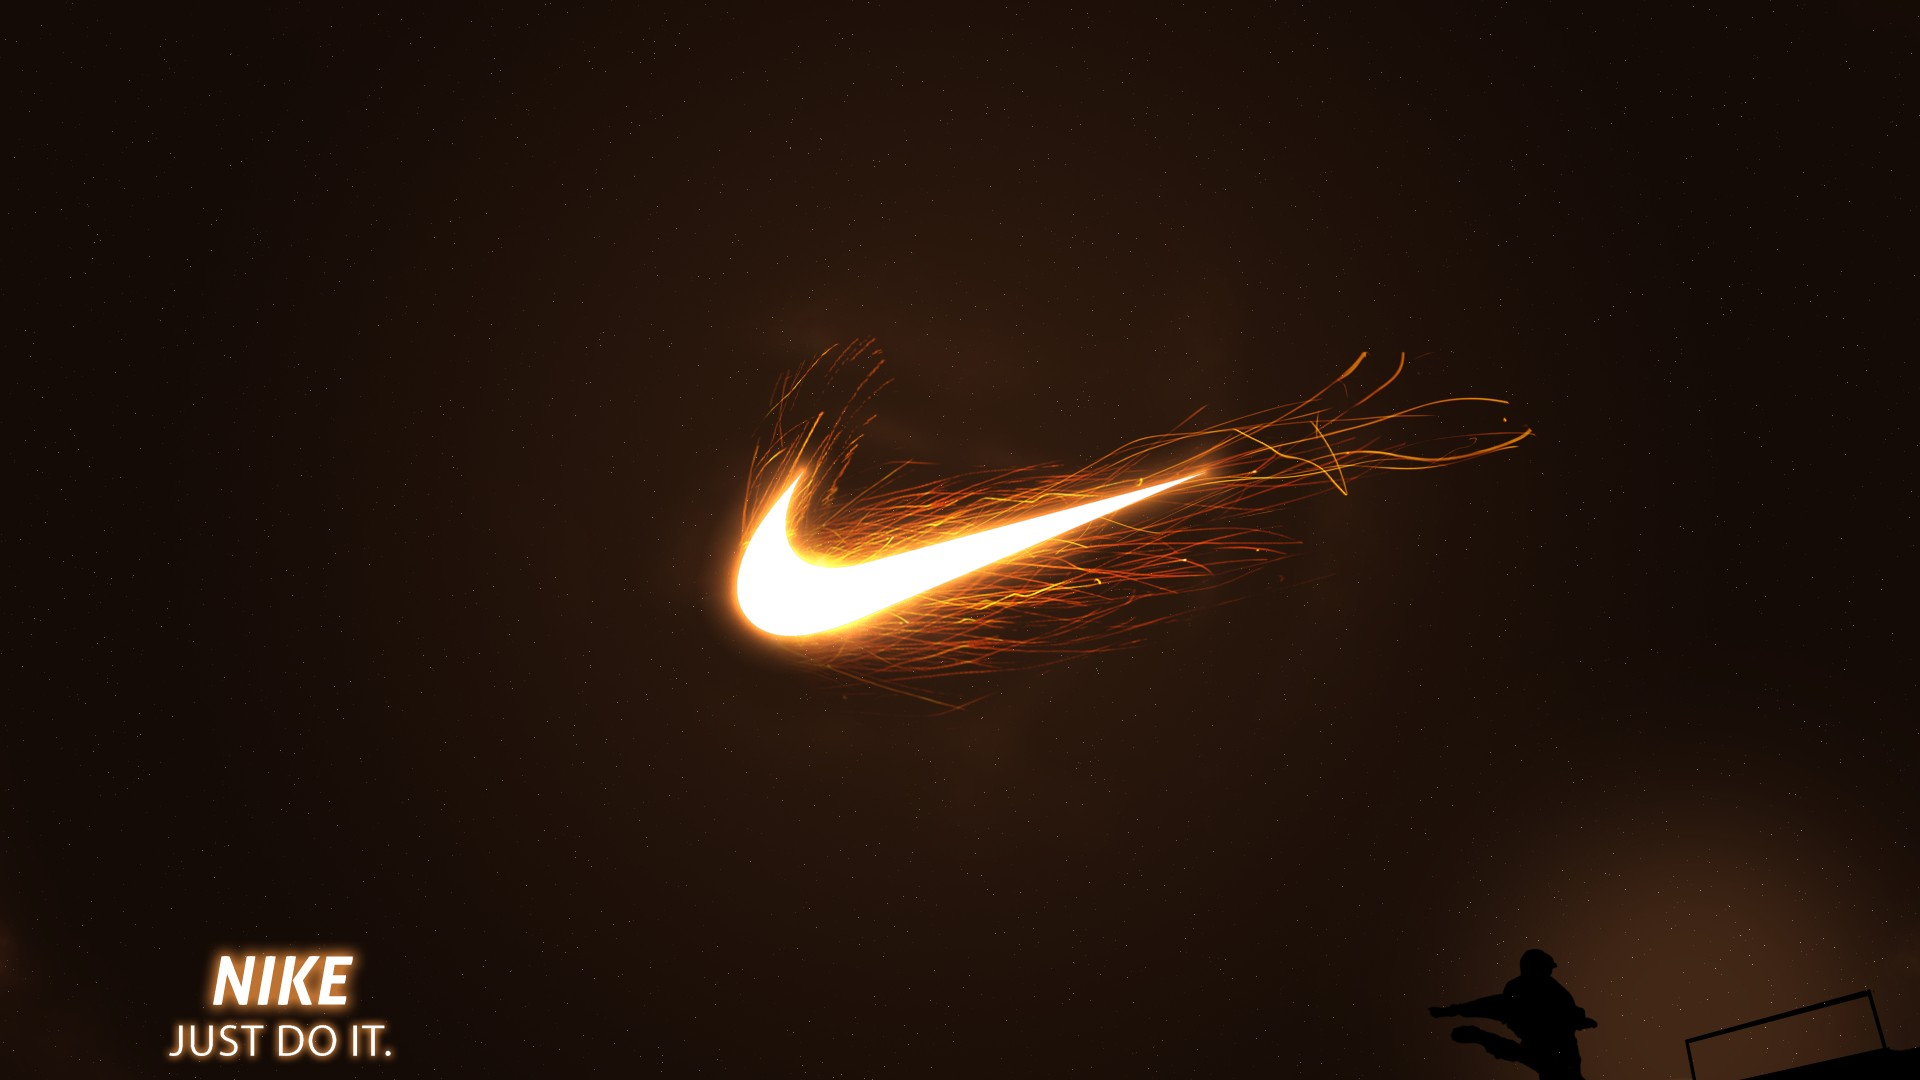 Nike Wallpapers Hd 211209 1920x1080